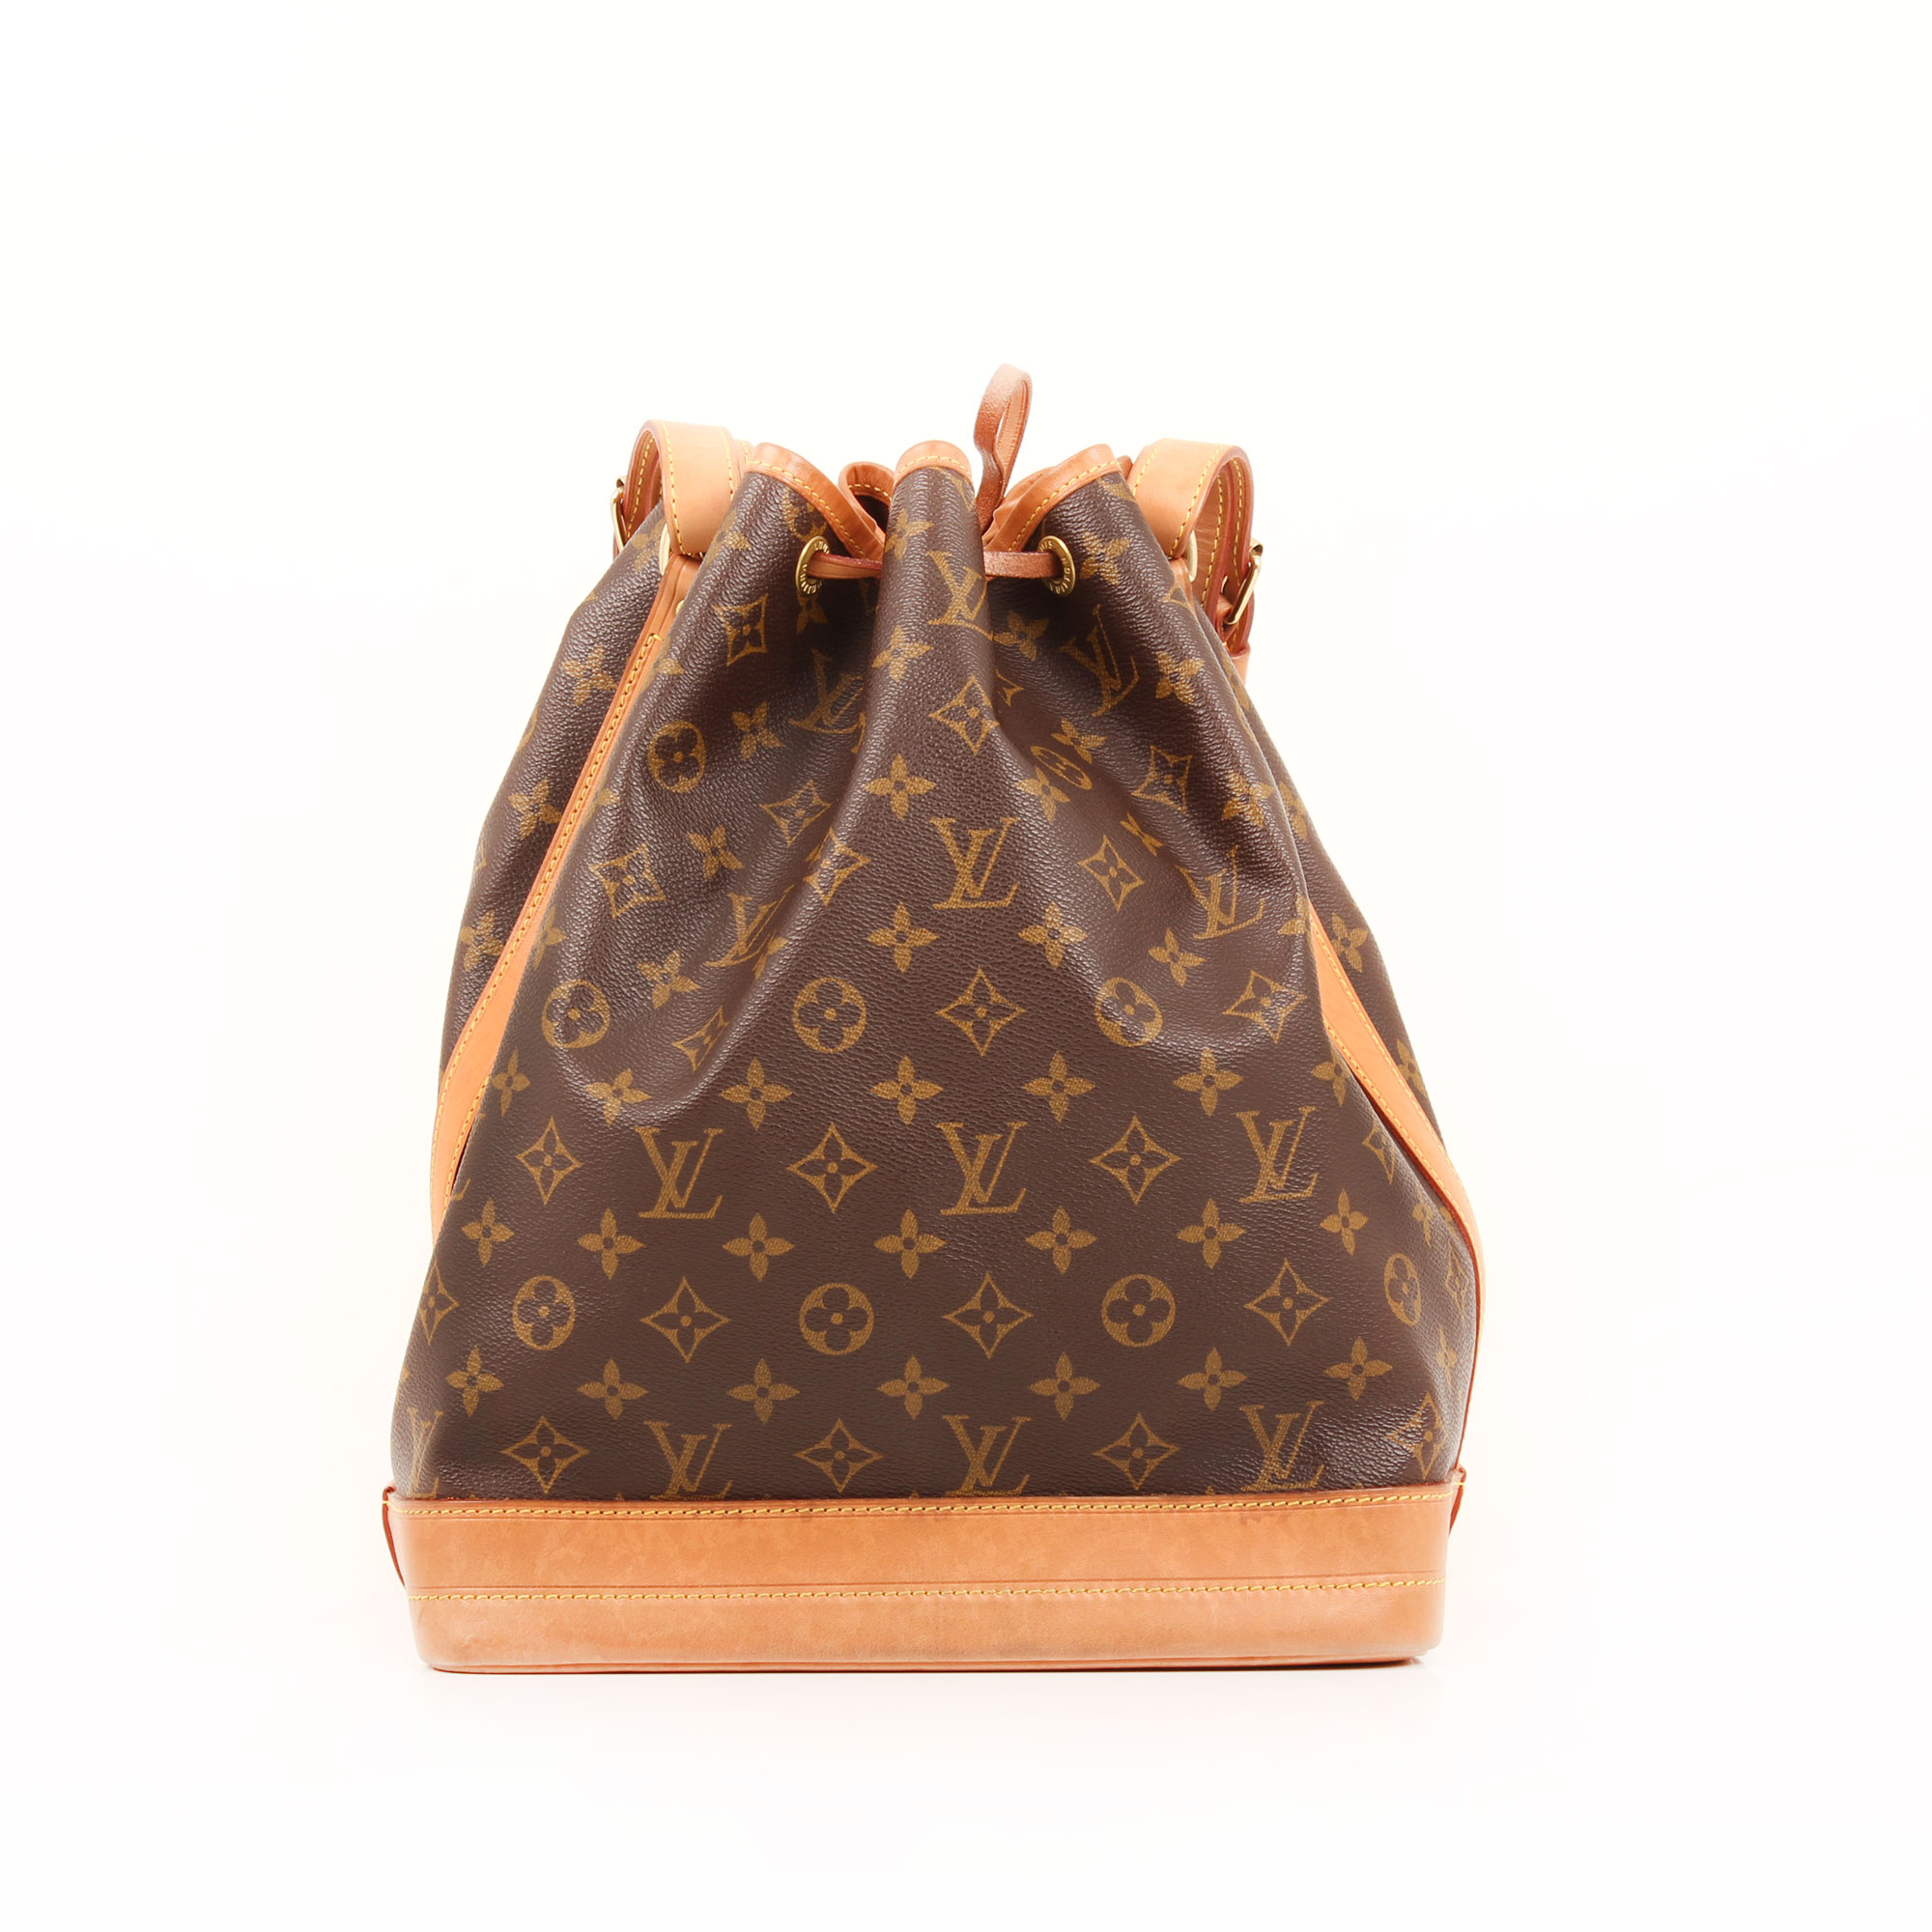 Back image of louis vuitton noe monogram bag